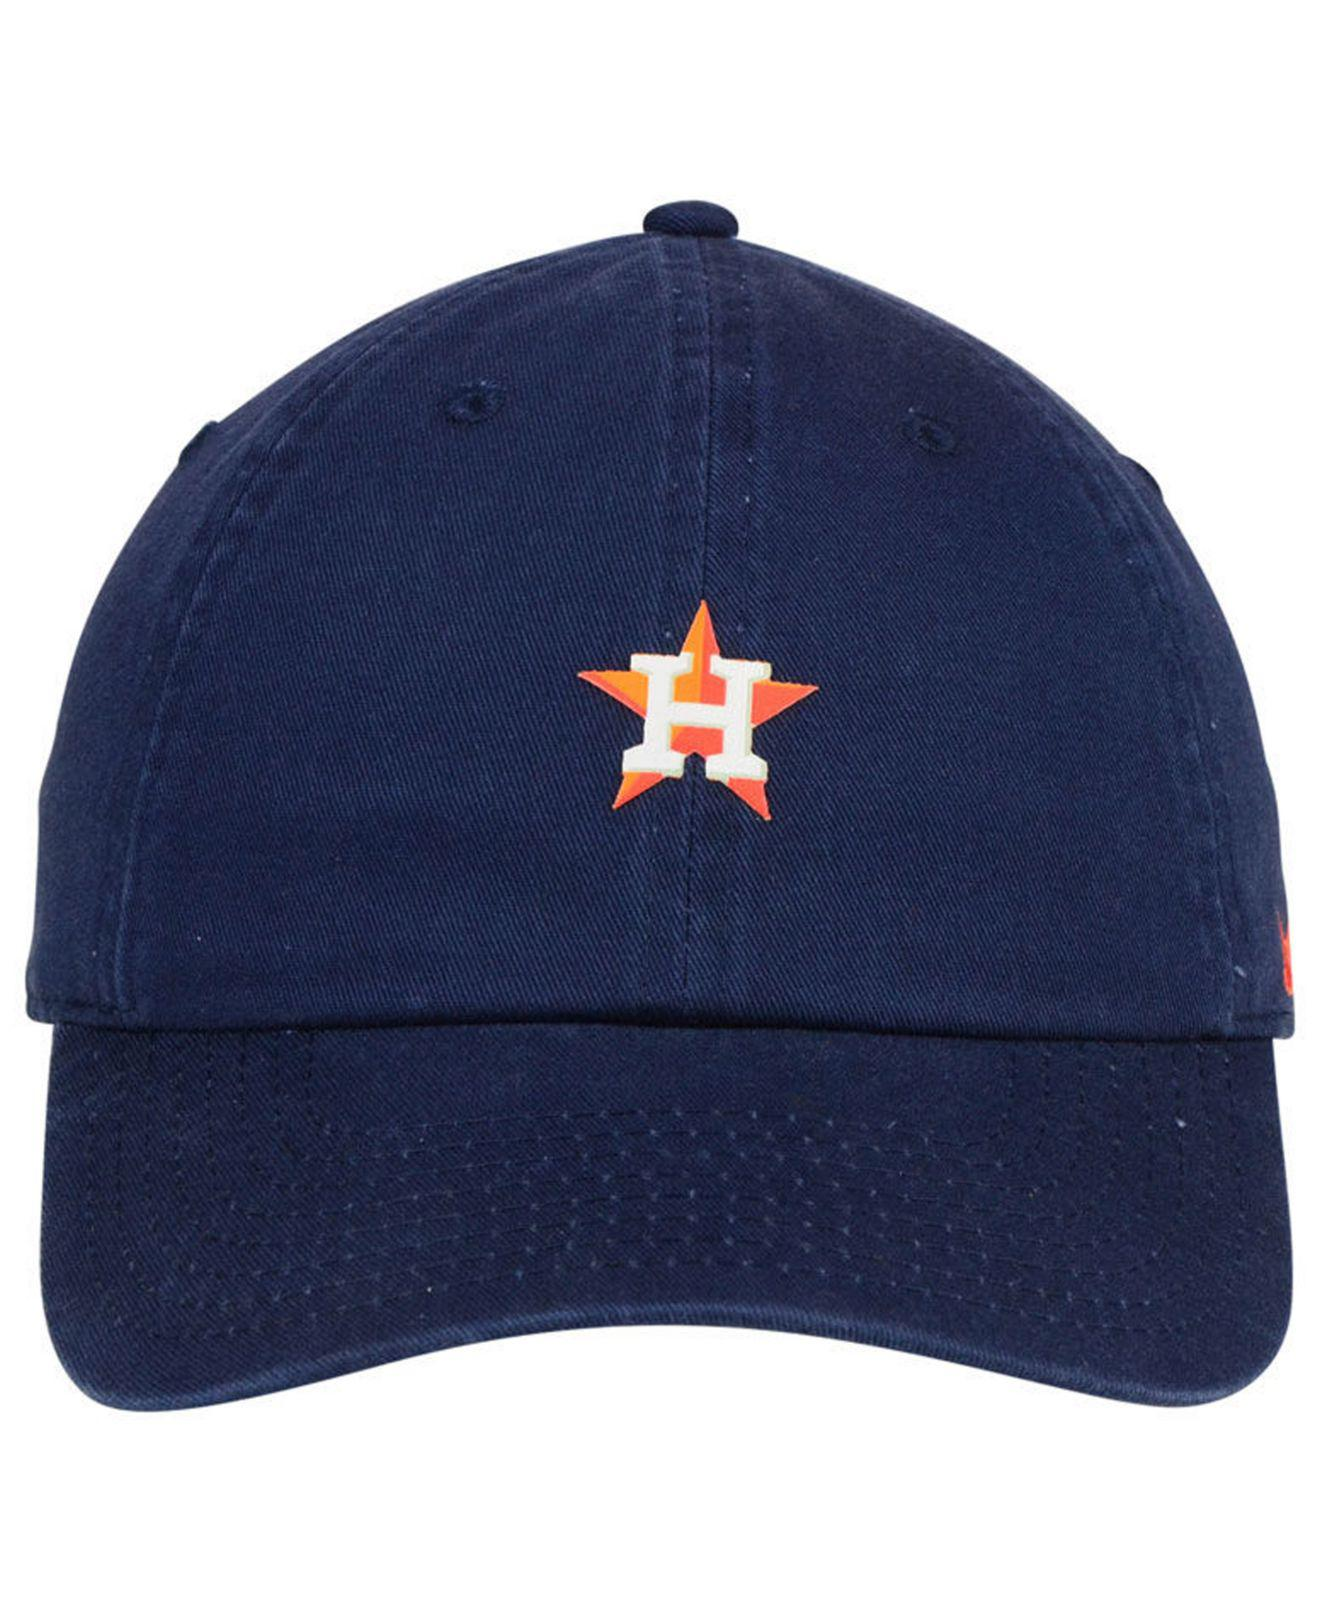 newest 257fd 4eb1f ... wholesale lyst nike houston astros micro cap in blue for men c22b0 aada6